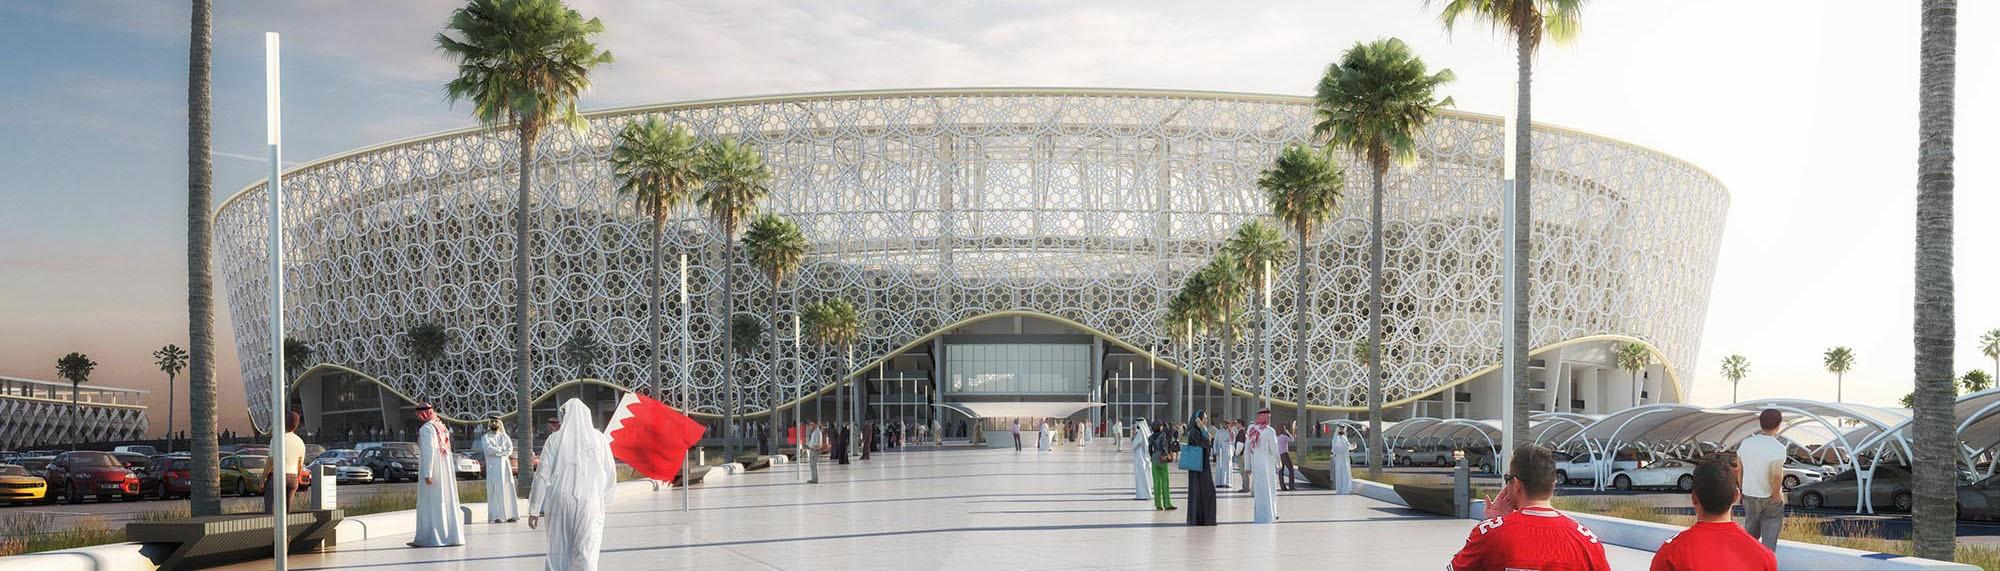 Bahrain Sports City Stadium